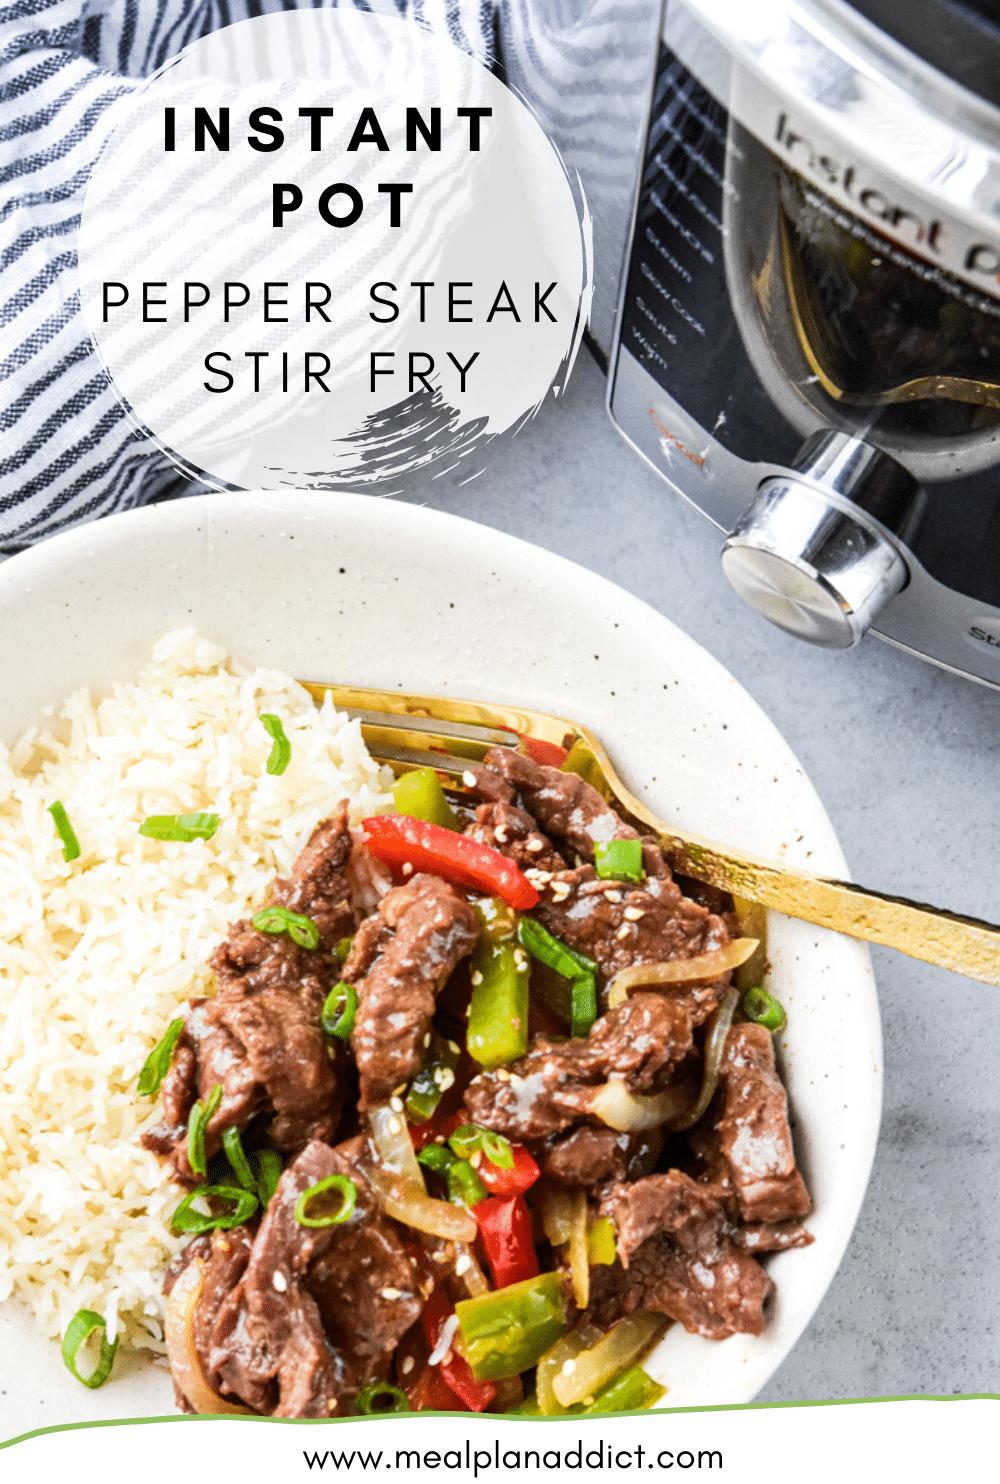 Instant Pot Pepper Steak Stir Fry